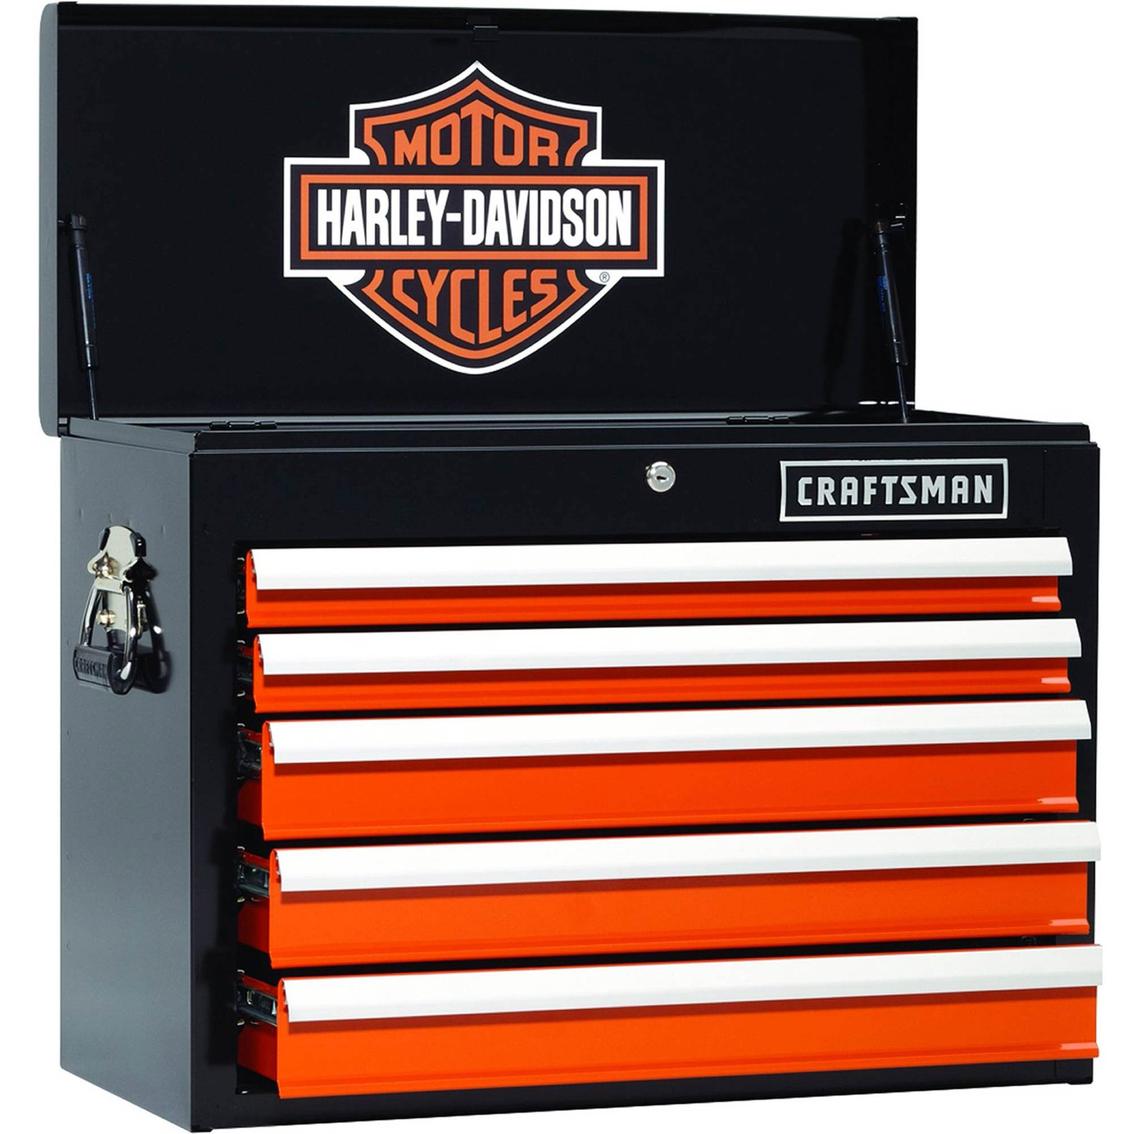 Craftsman Harley Davidson 26 In 5 Drawer Chest Tool